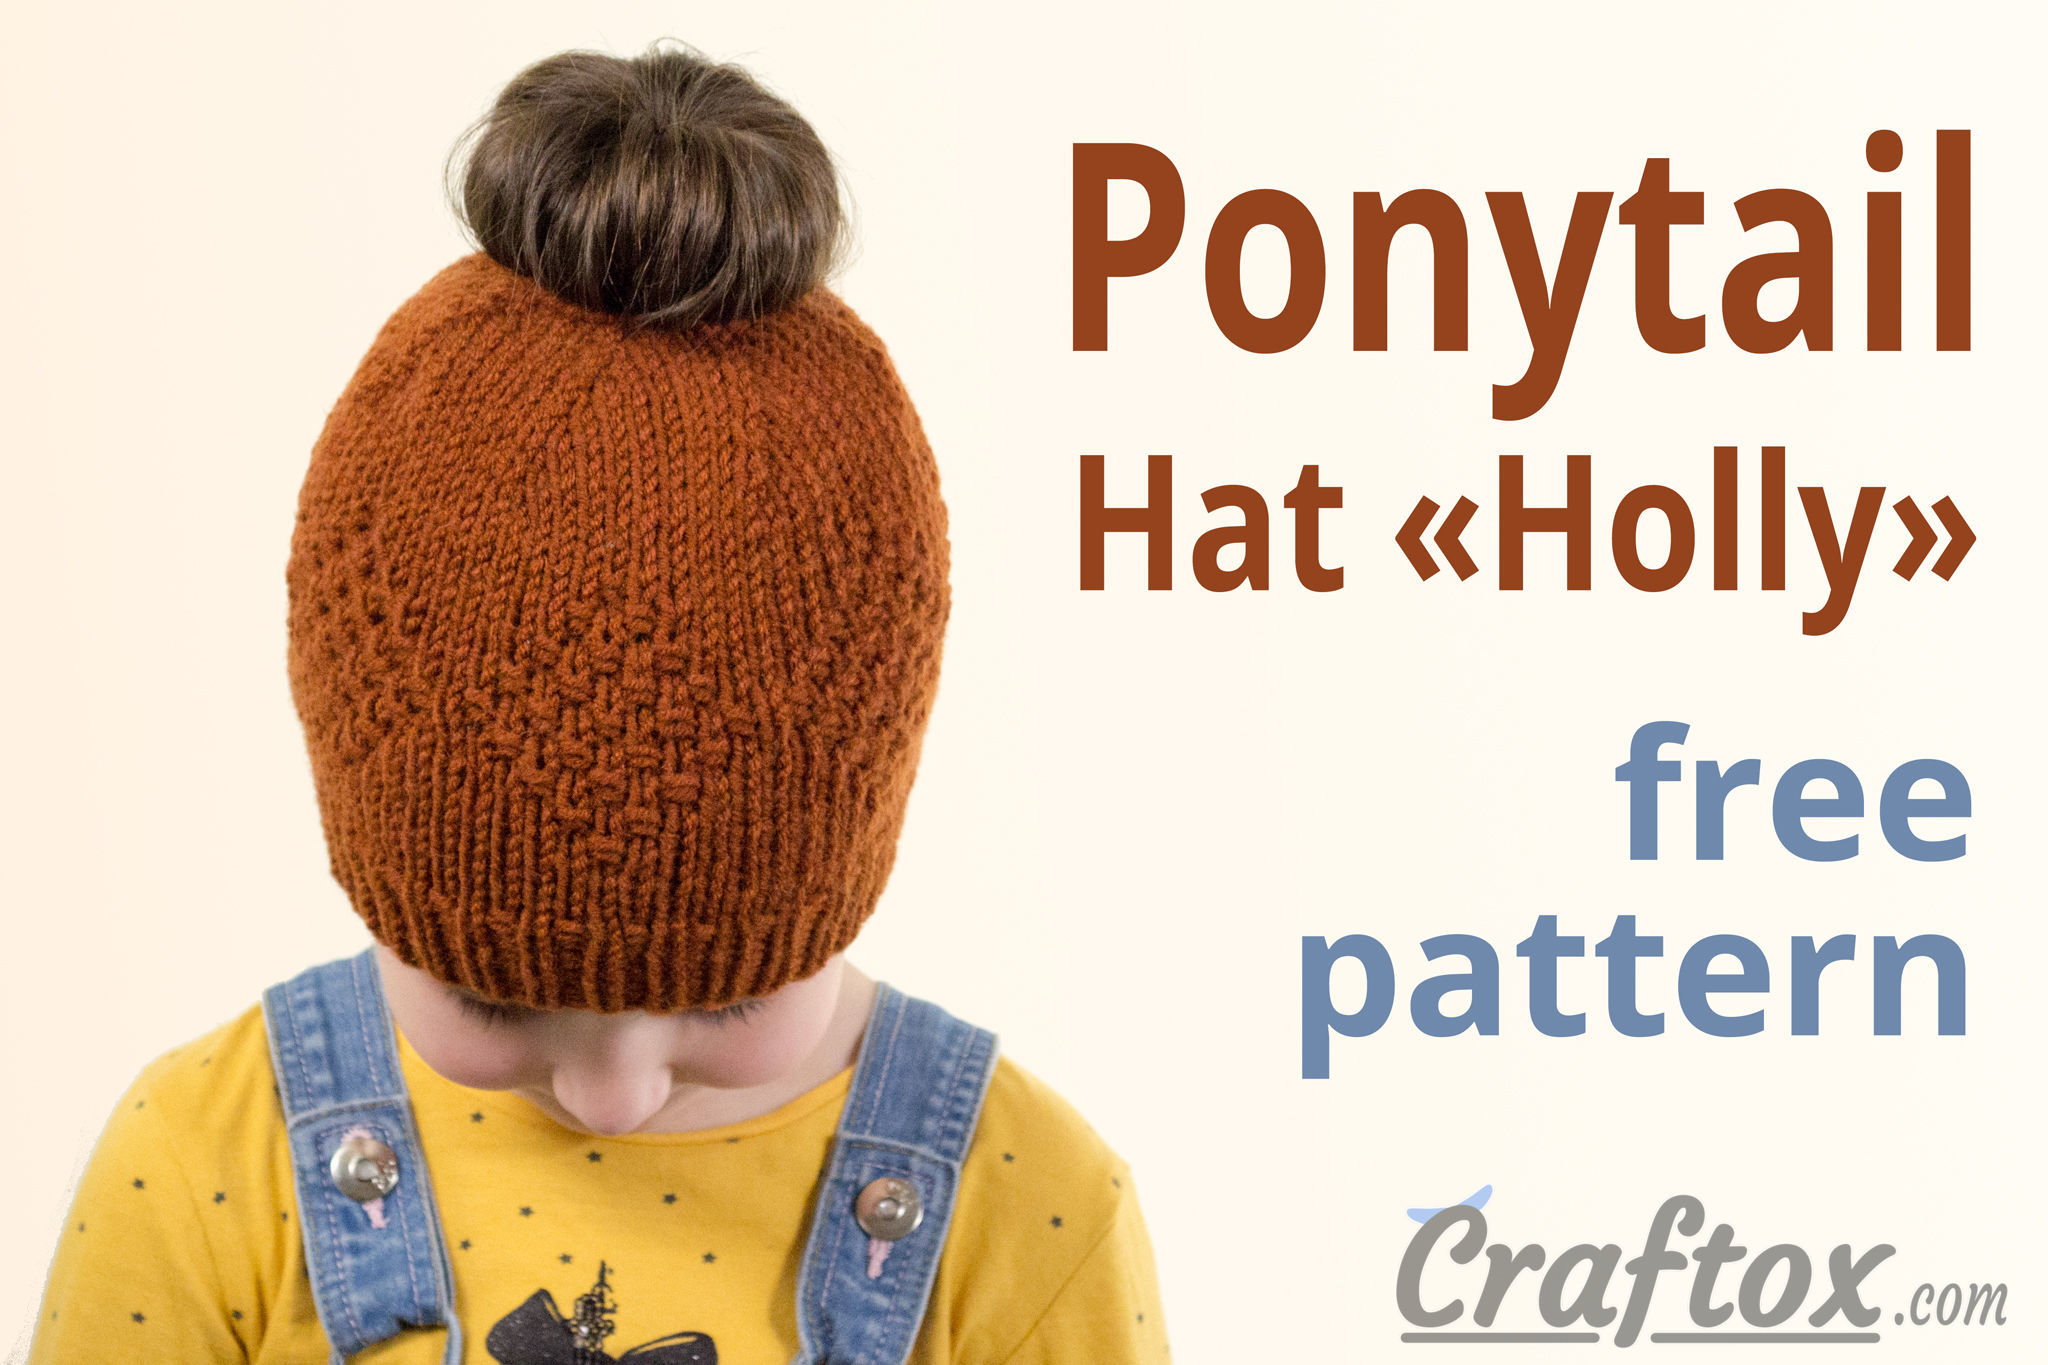 Ponytail hat \